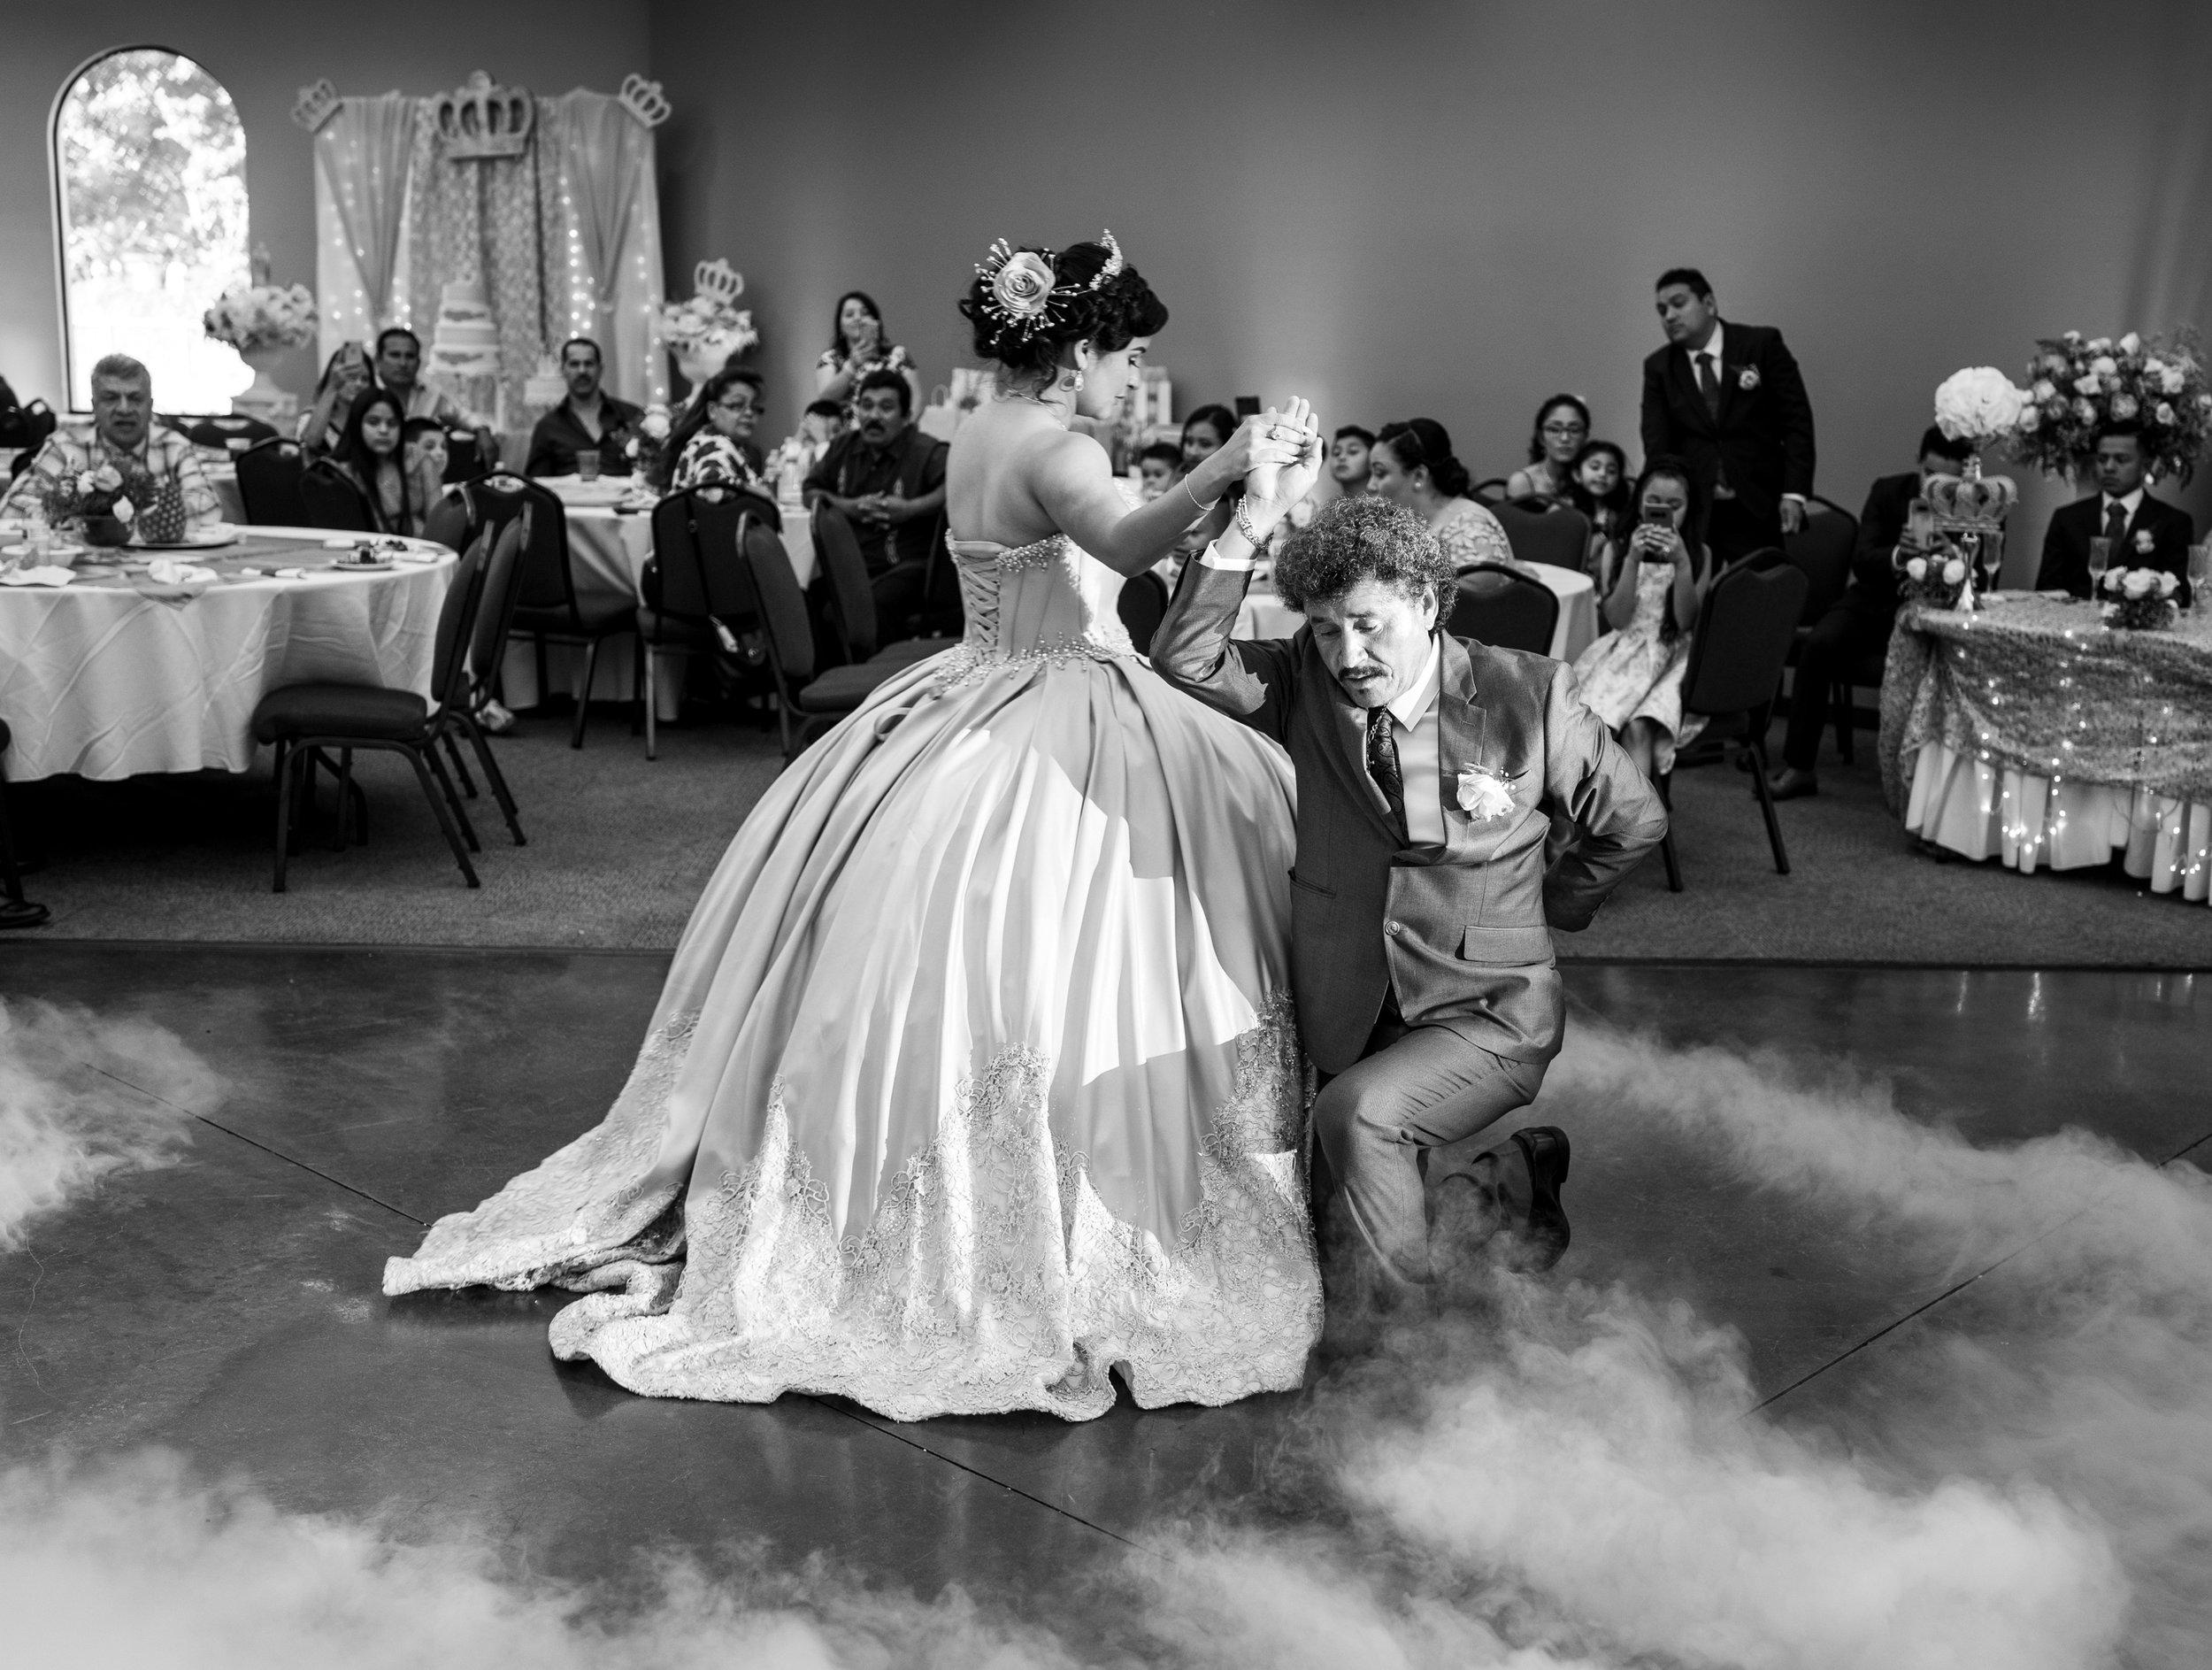 Adolofo Gonzalez and his daughter Adriana Gonzalez waltz during Adriana's quinceañera in Sacramento, California